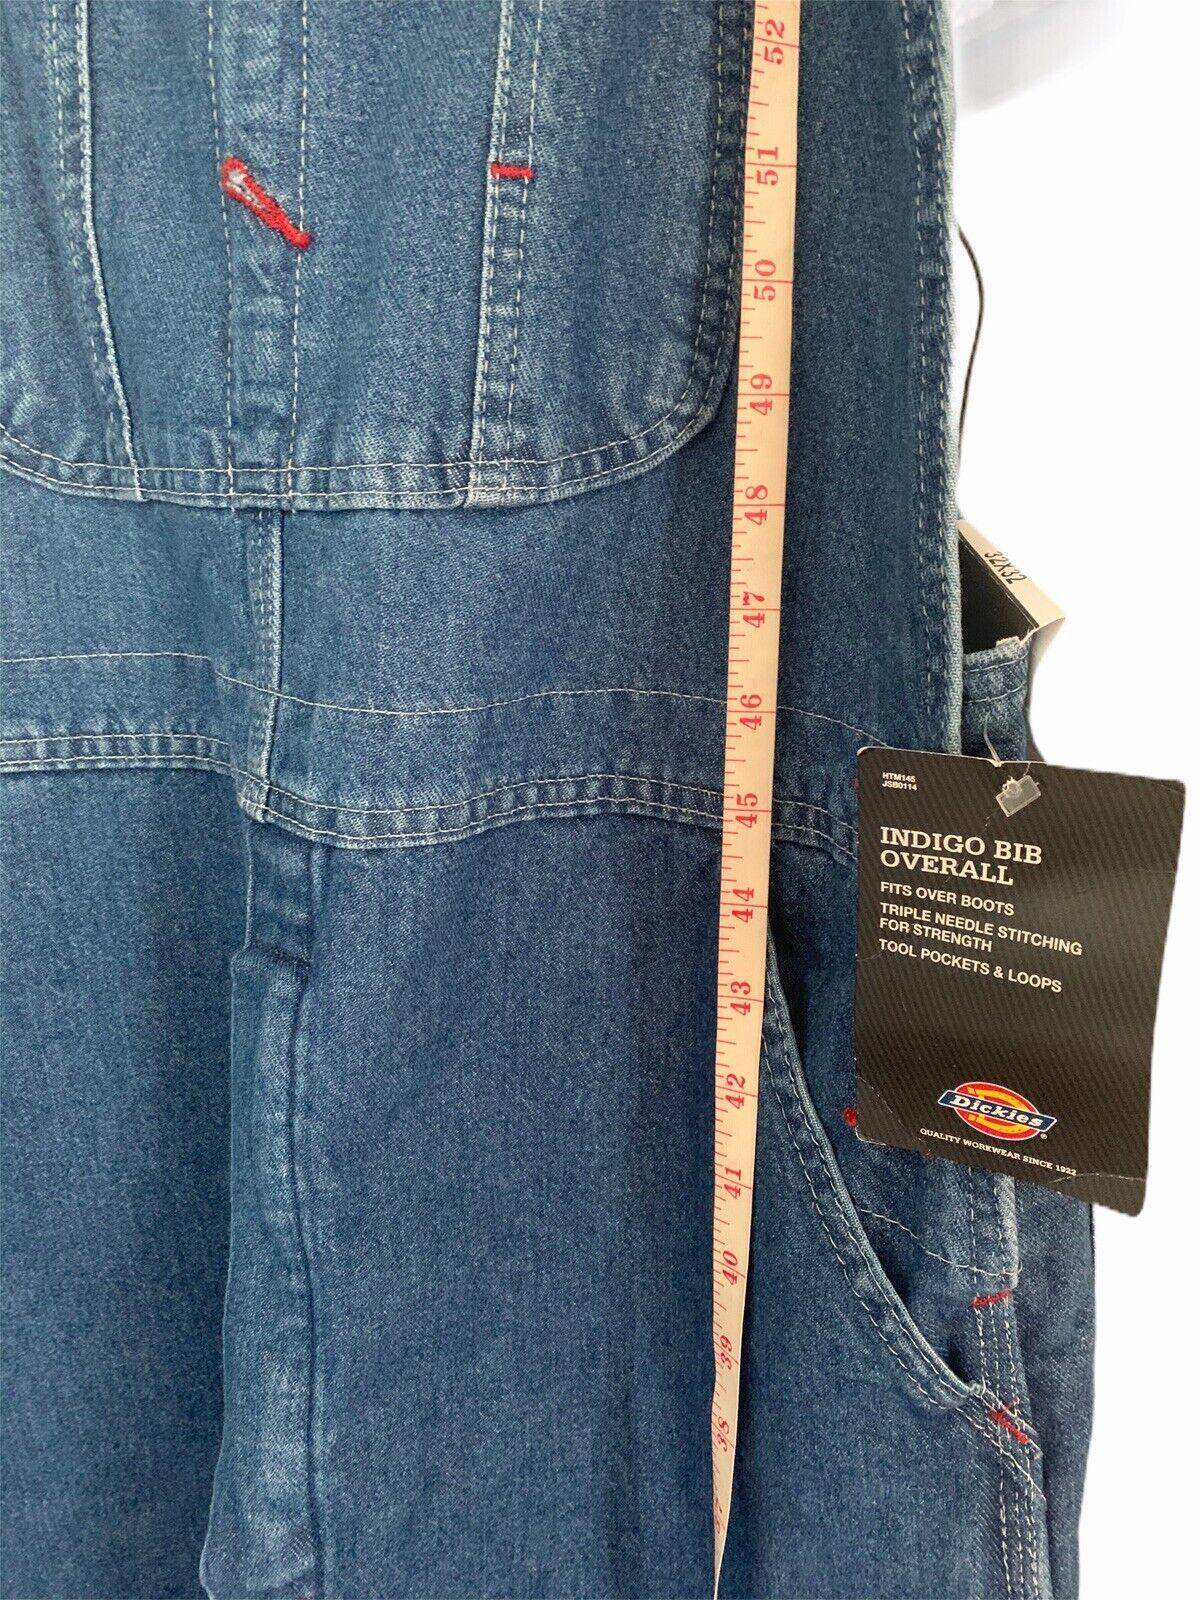 dickies overalls mens - image 4